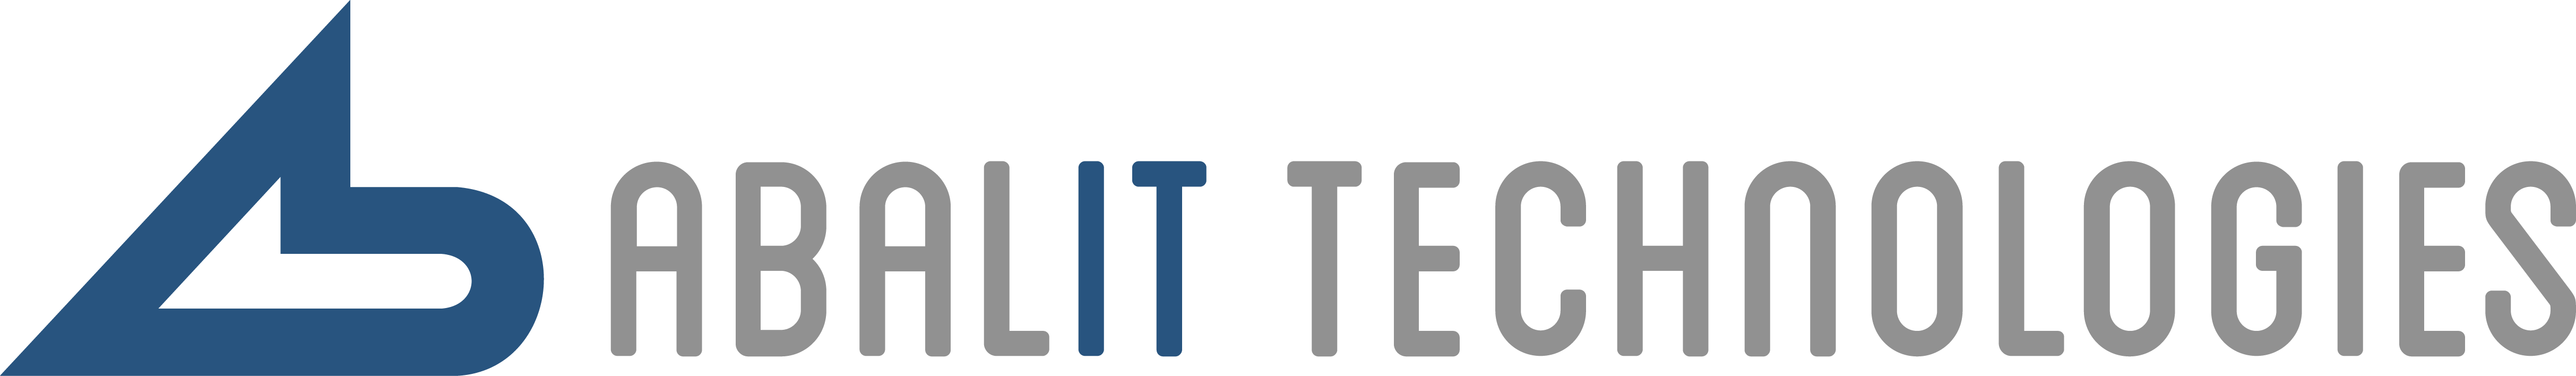 Blog sobre aplicaciones móviles de Abalit Technologies Madrid